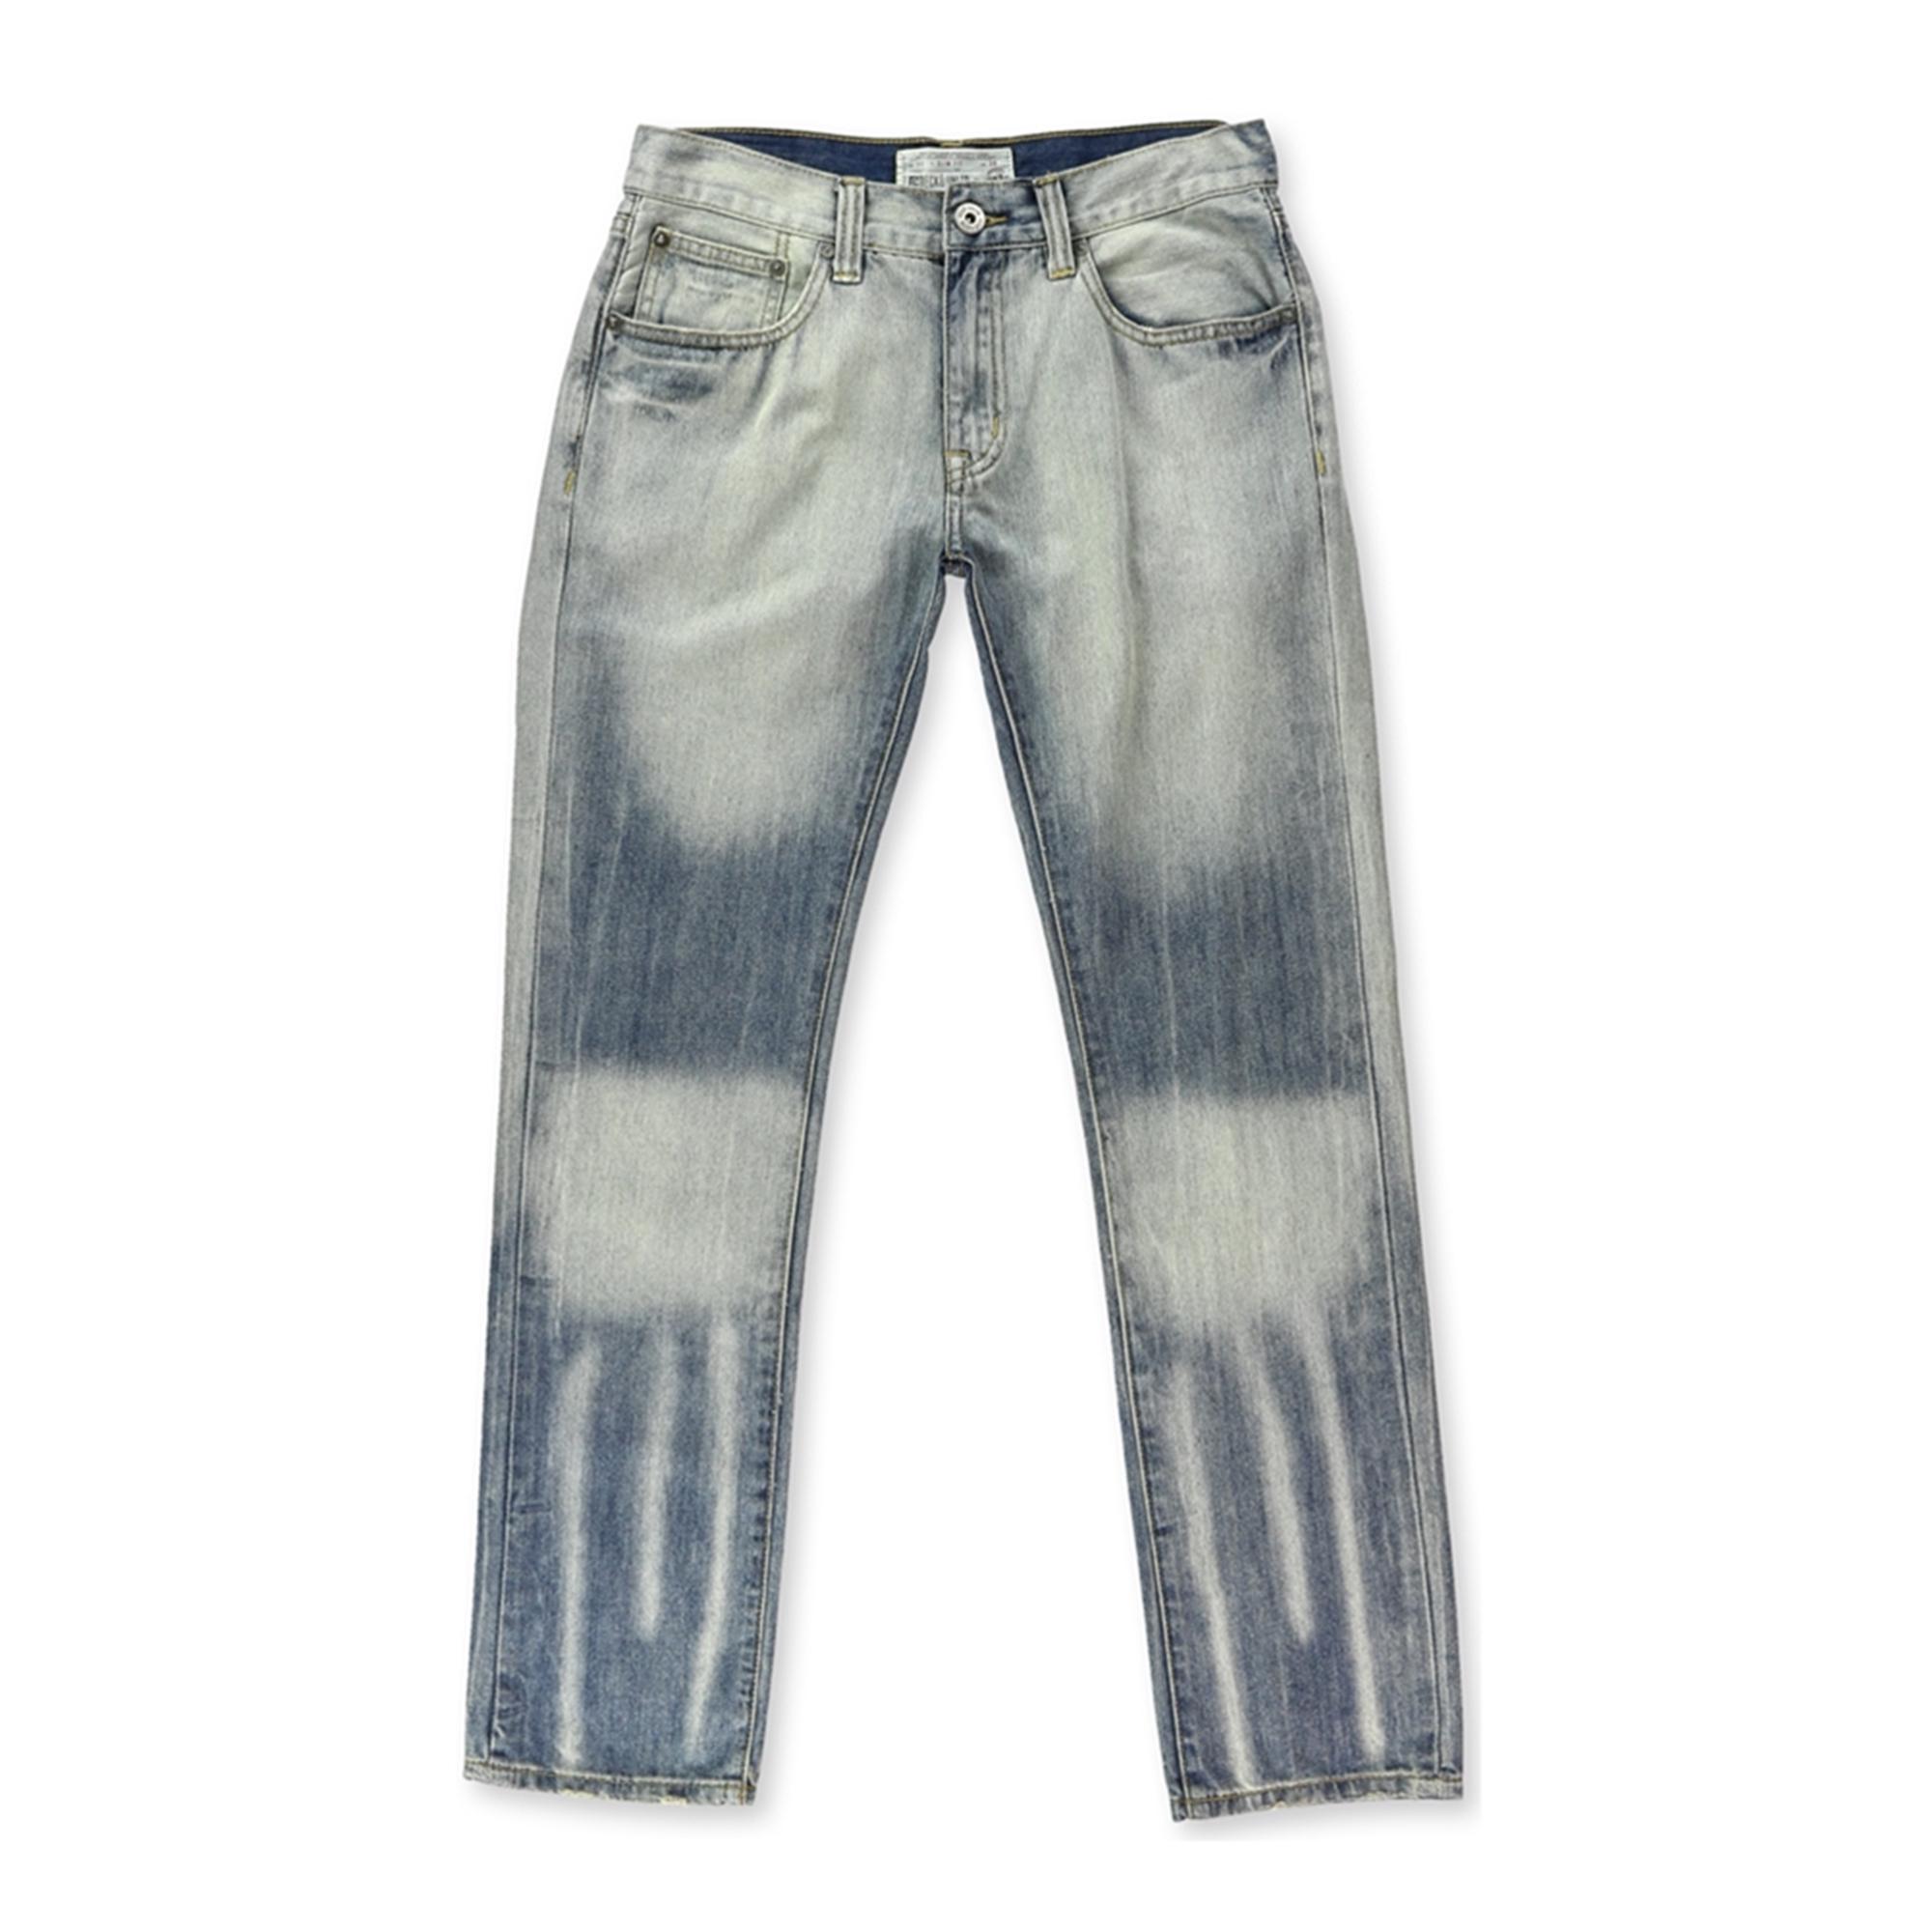 Ecko Unltd. Mens 711 Castoff Slim Fit Jeans